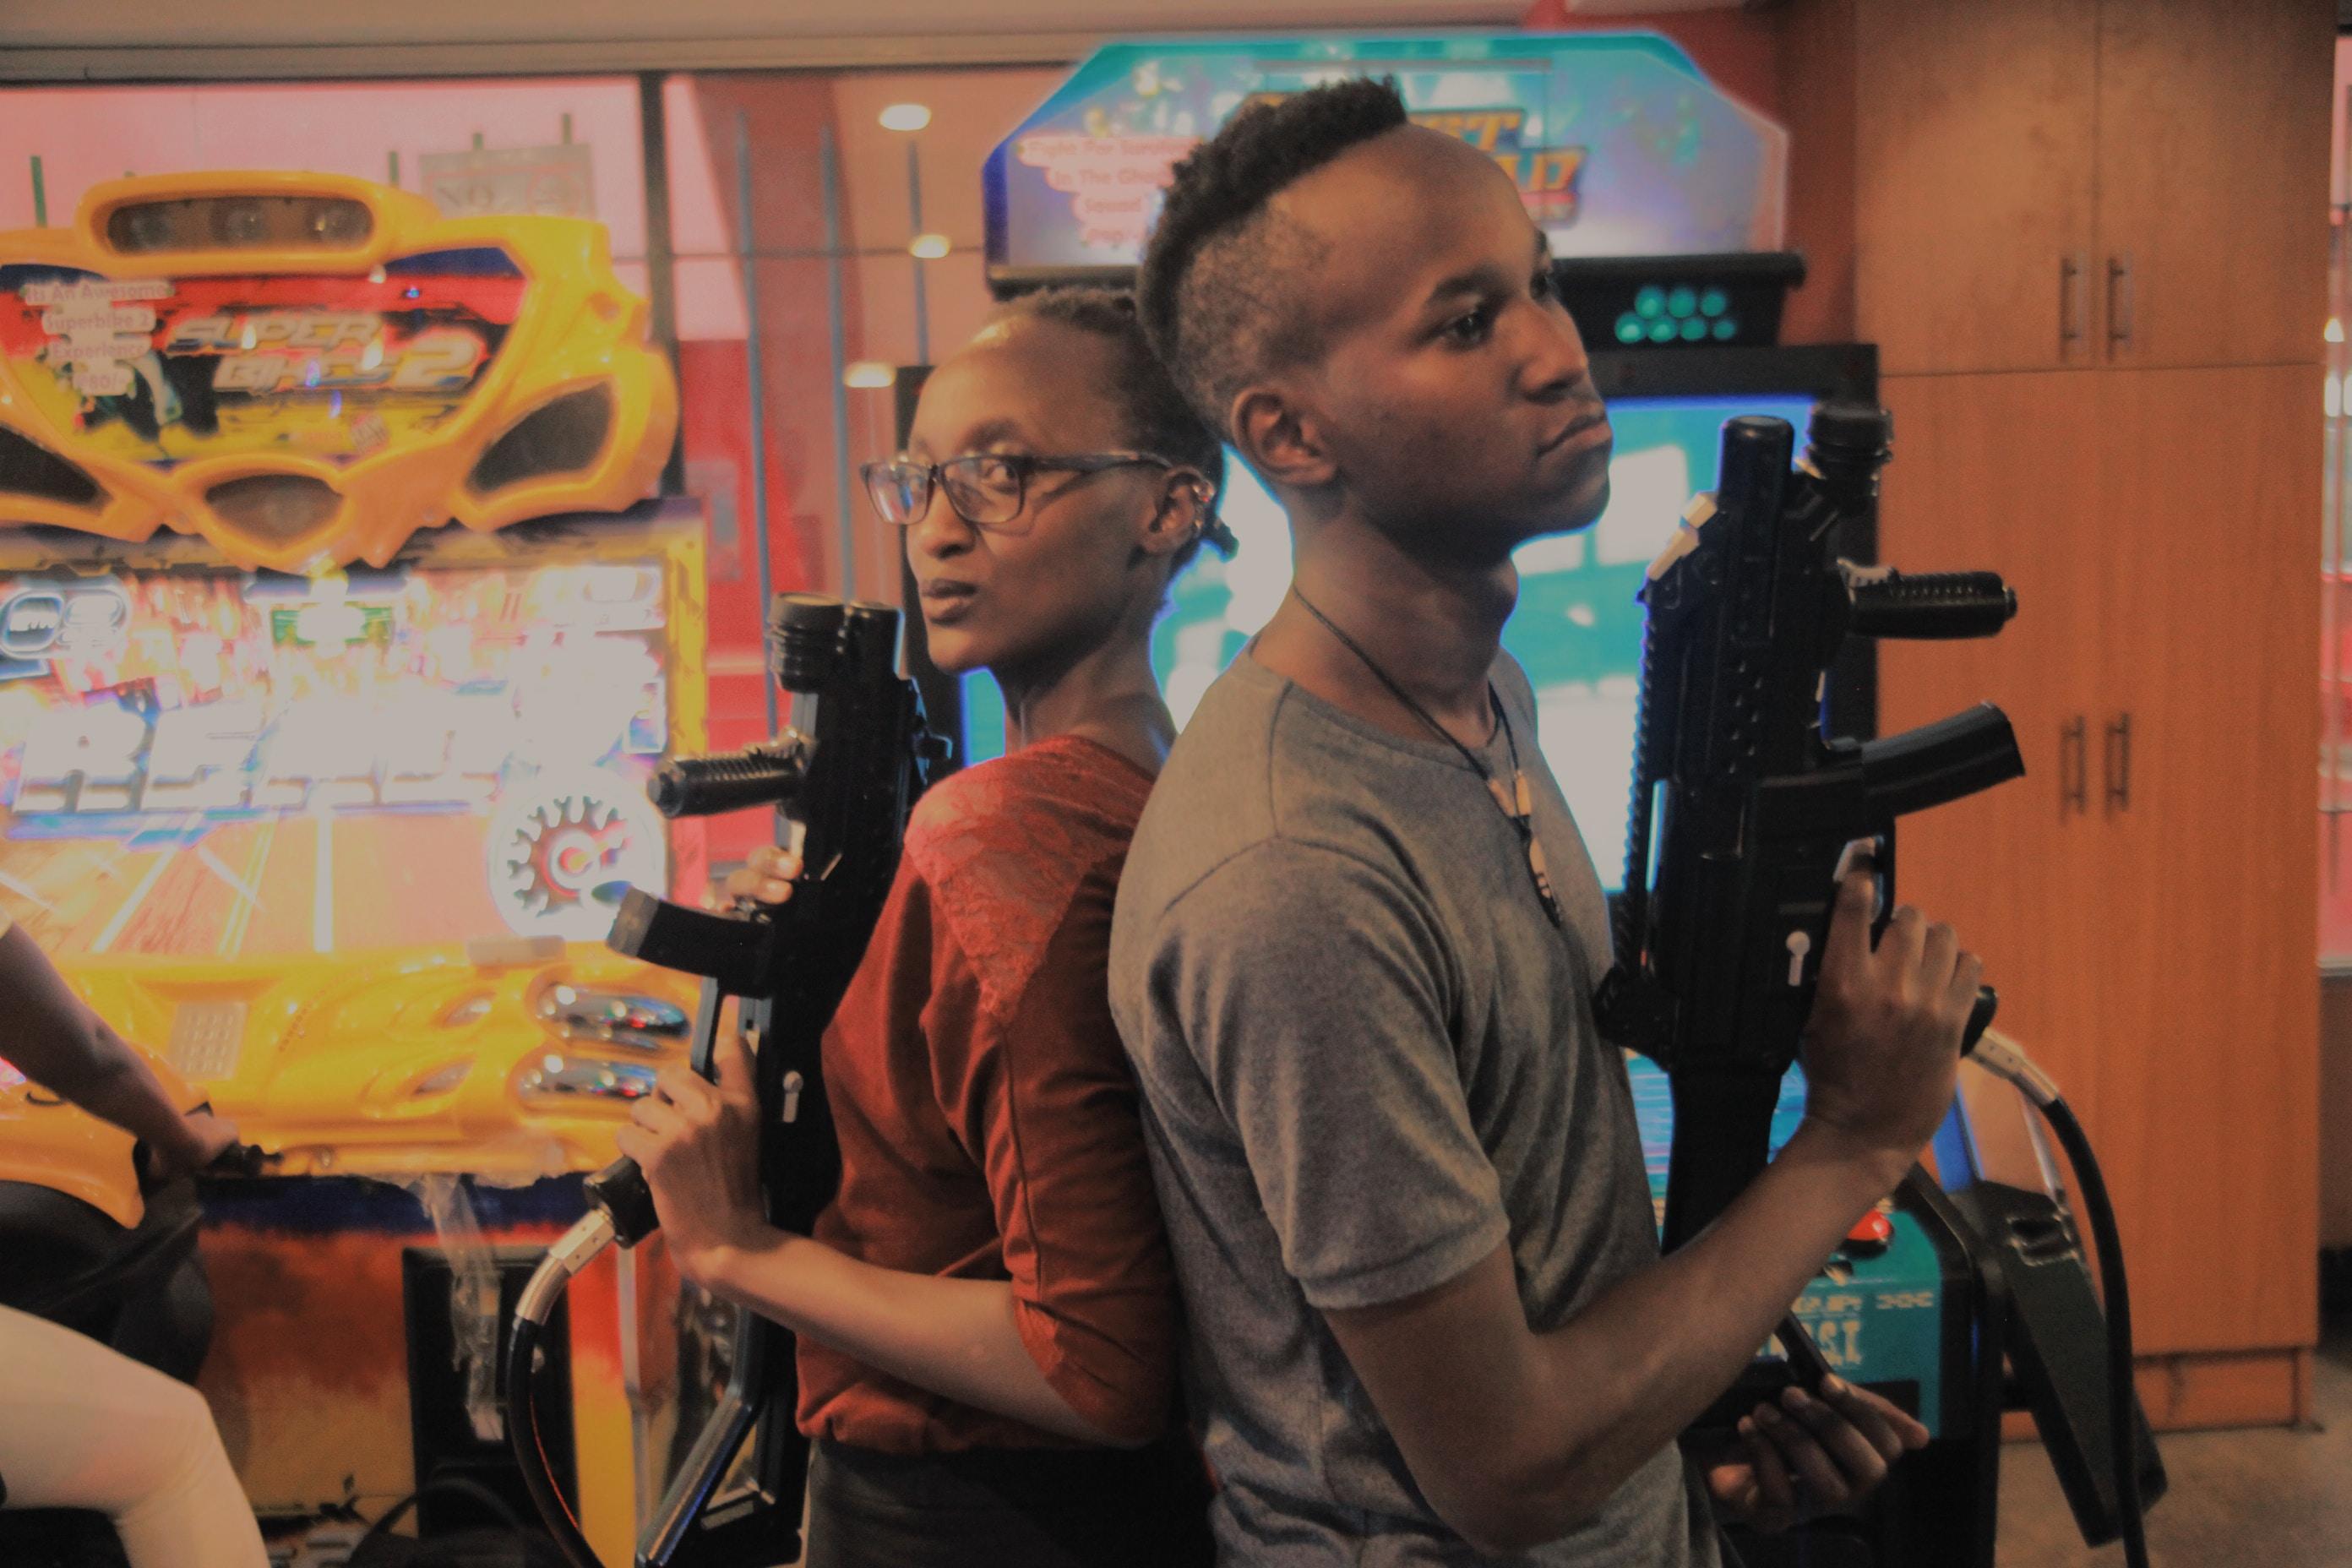 man and woman holding assault rifle arcade controller